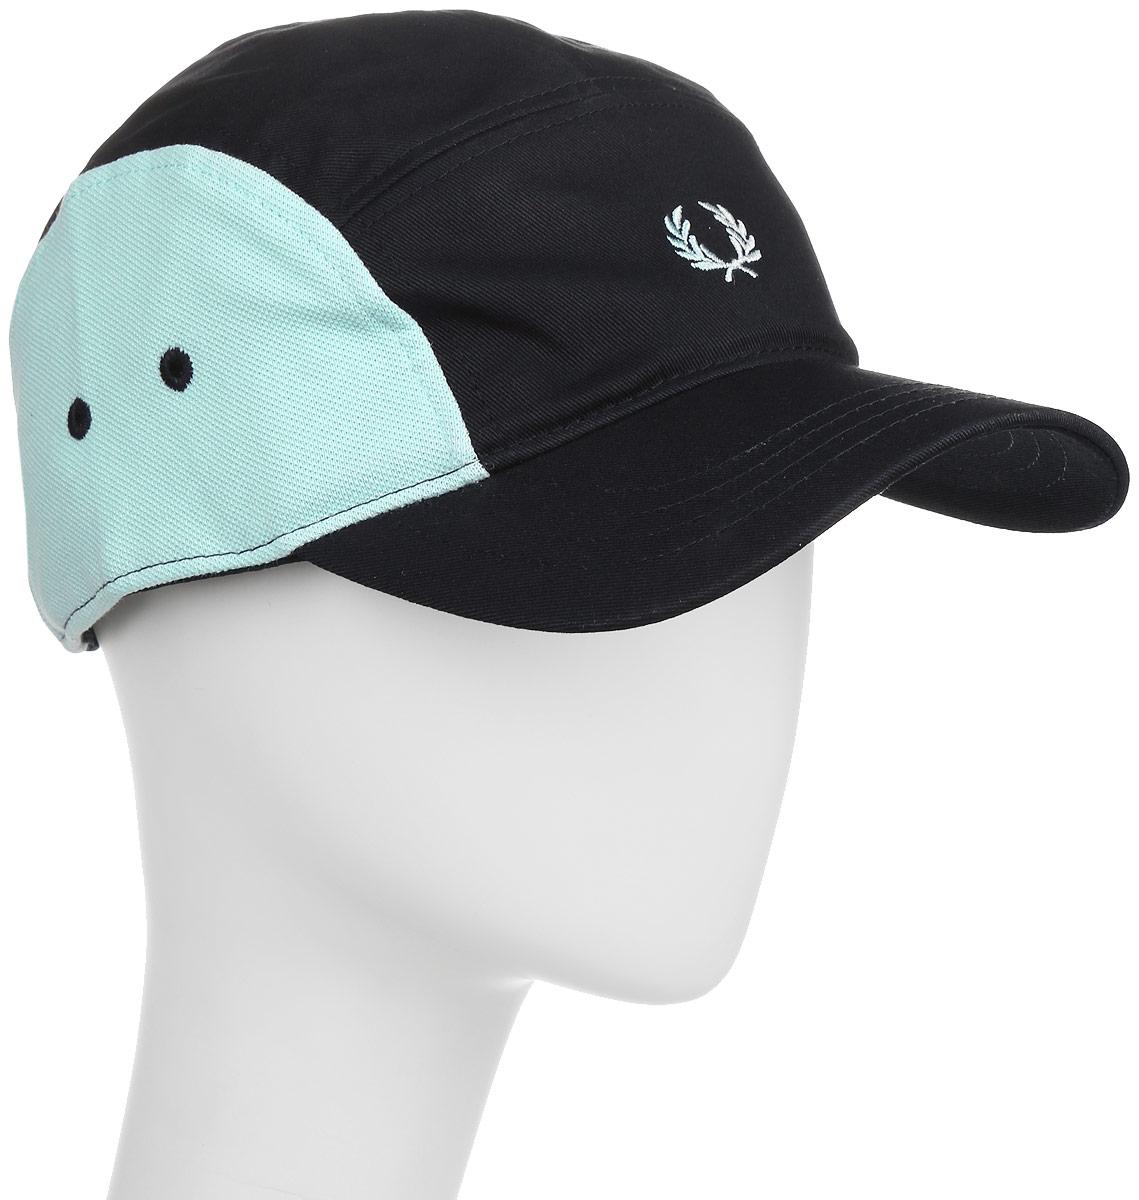 Кепка мужская Fred Perry Pique Mix 5 Panelled Baseball Cap, цвет: синий. HW1615-608. Размер универсальныйHW1615-608